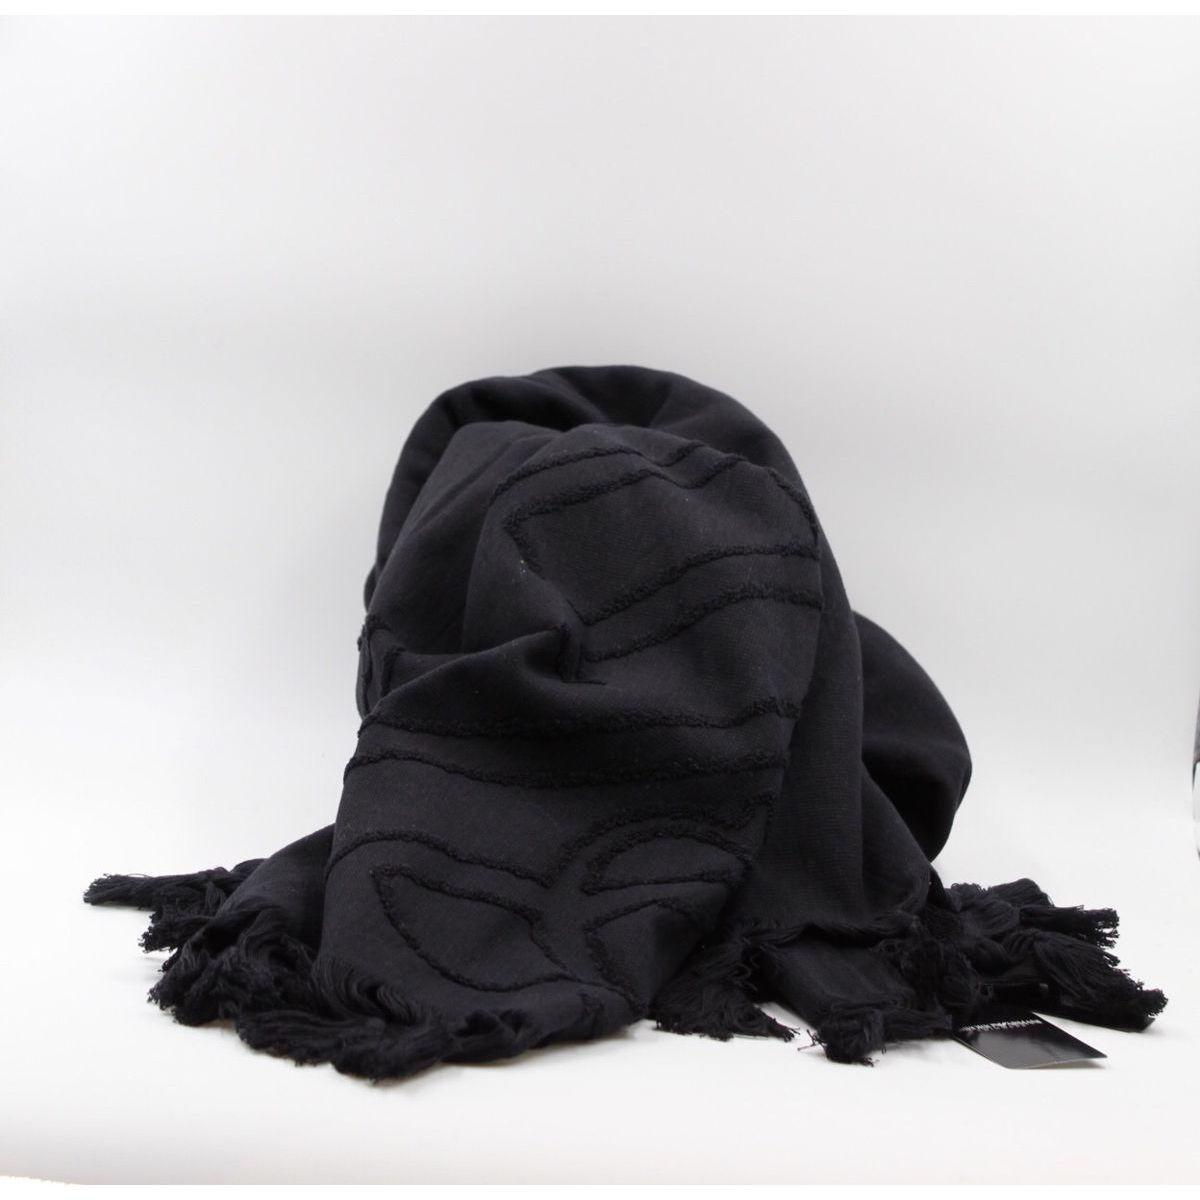 GA towel Black Emporio Armani